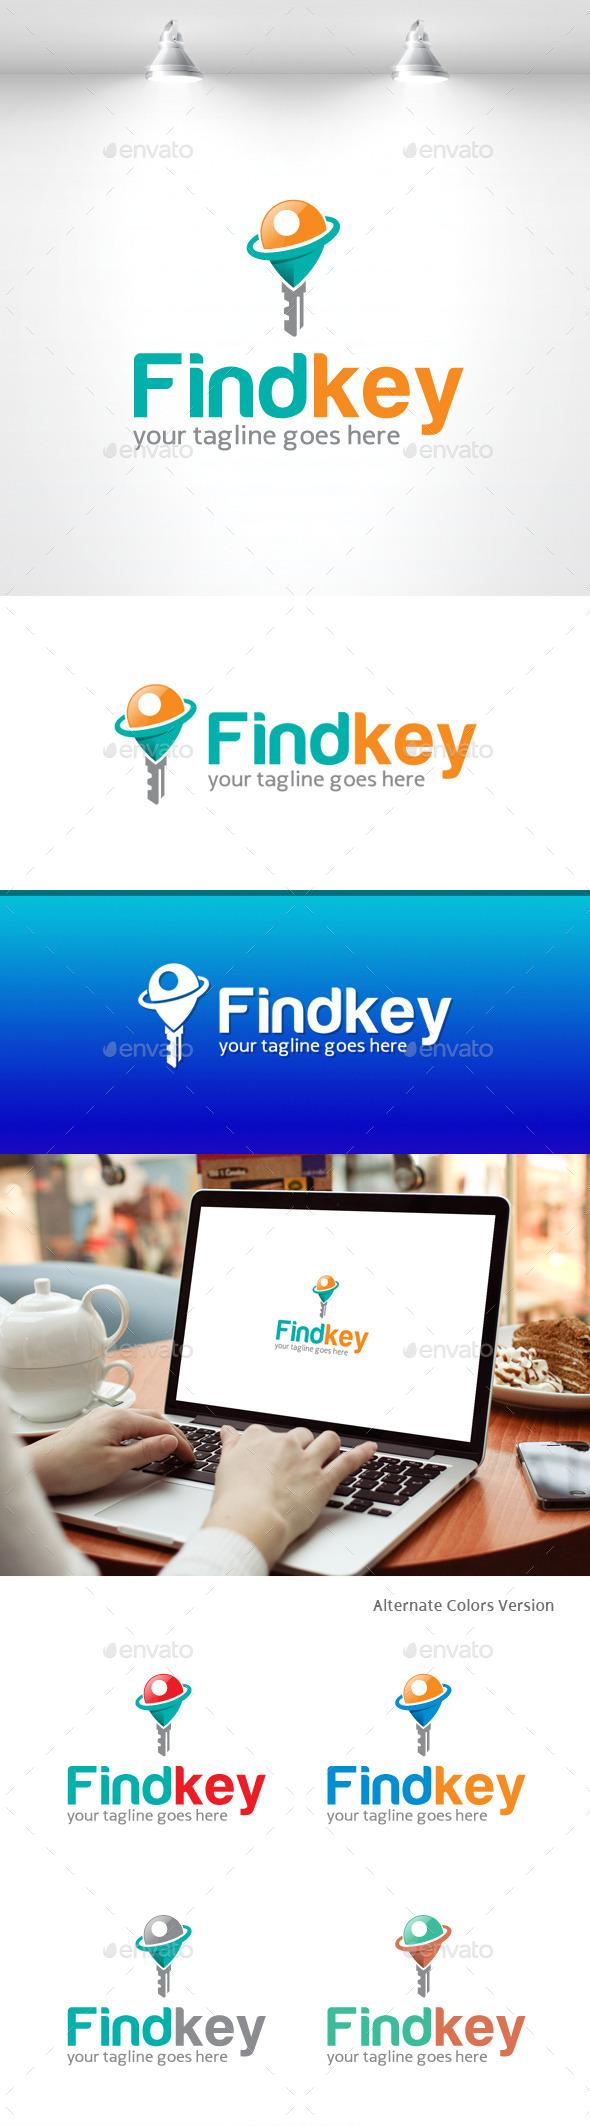 Find Your Key Logo